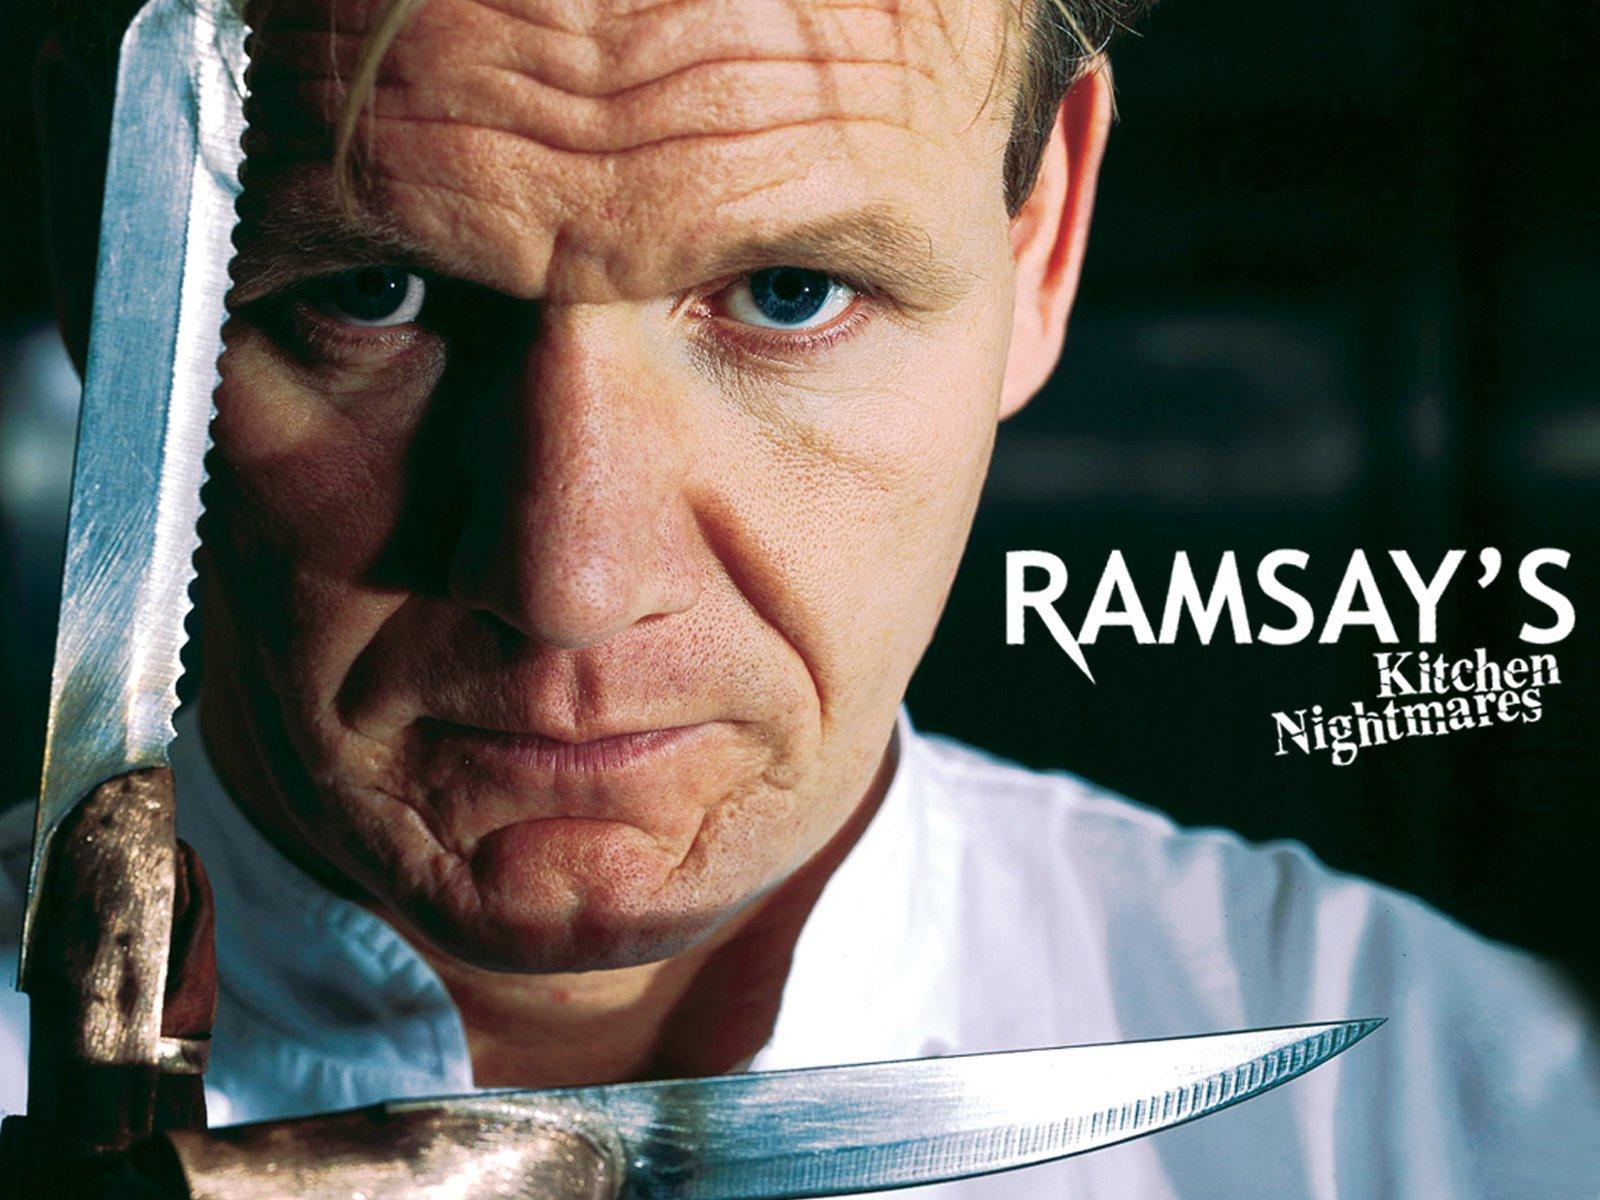 Ramsays kitchen nightmares uk version